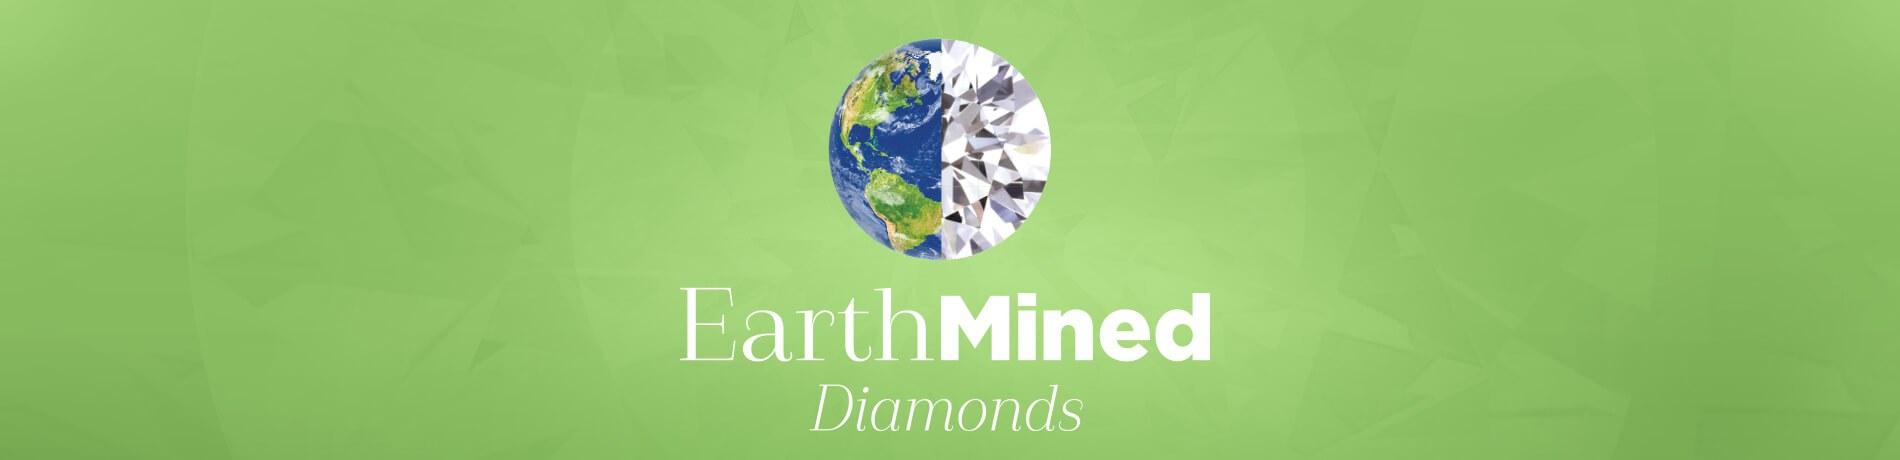 Earth Mined Diamonds